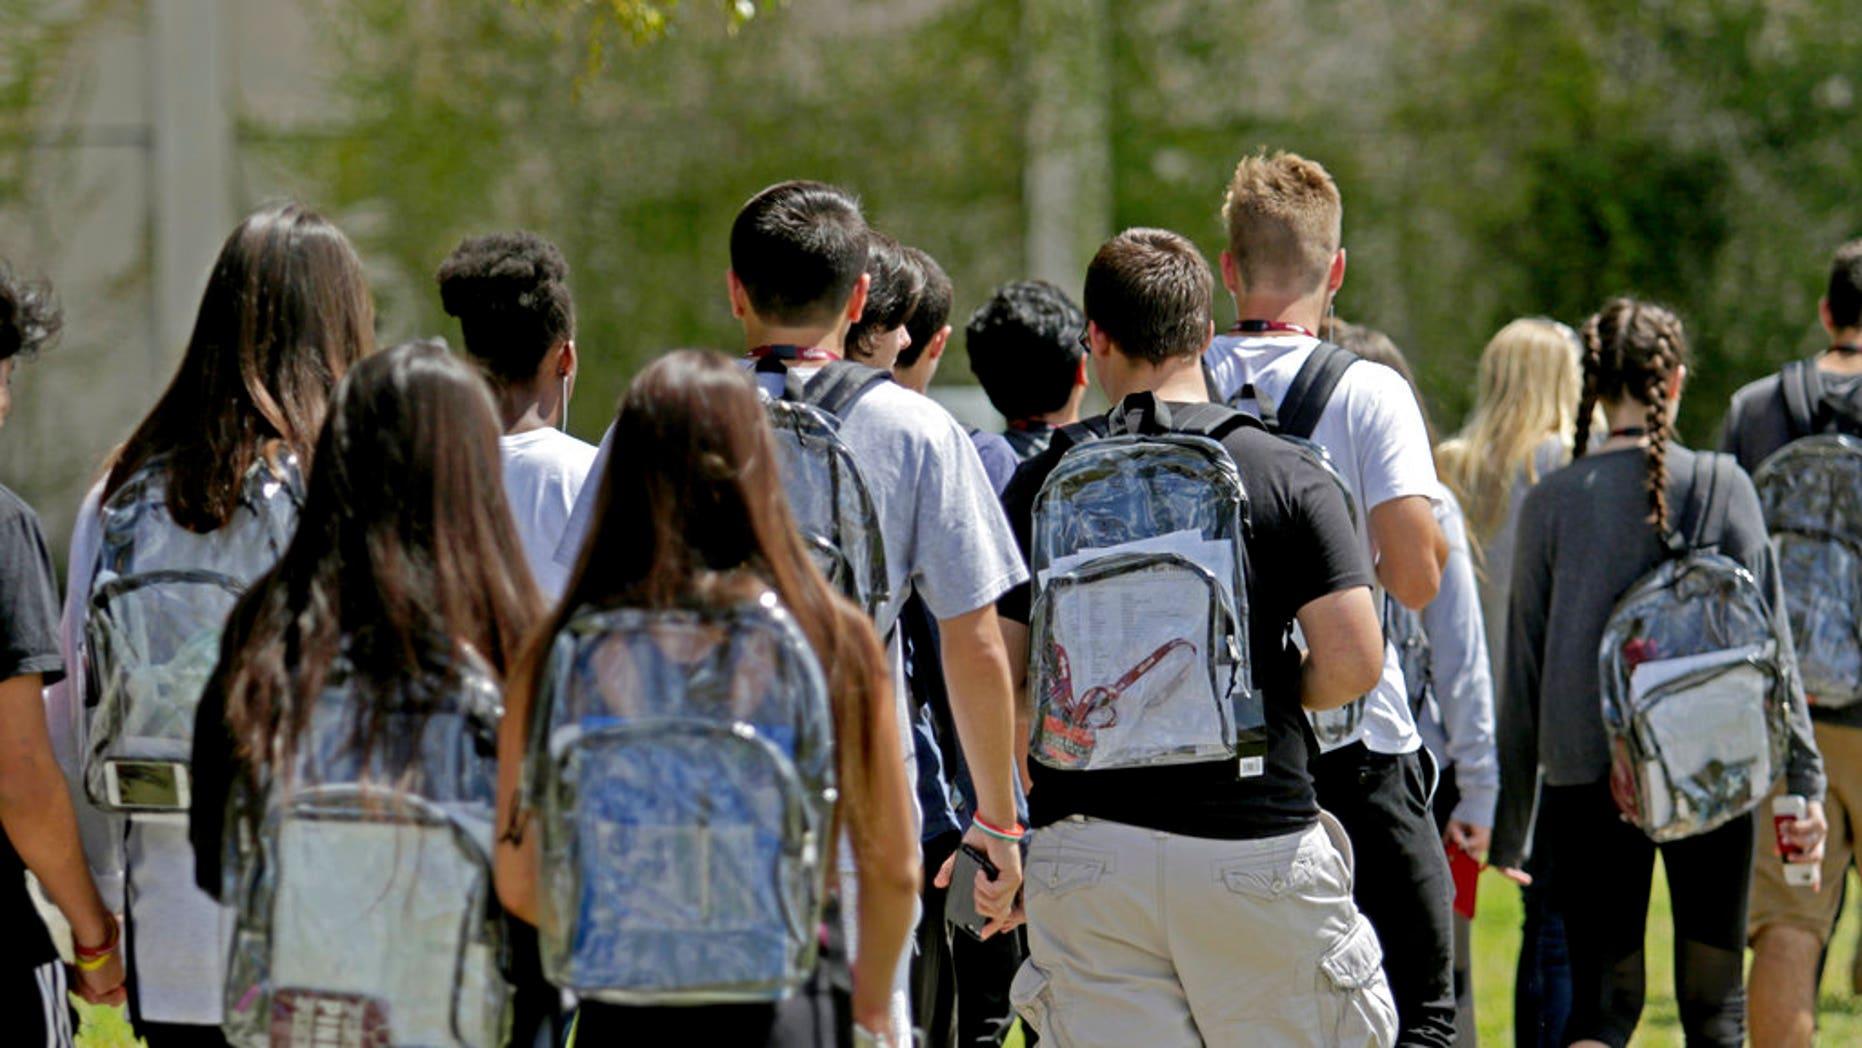 1f657dc409 Students wear clear backpacks outside of Marjory Stoneman Douglas High  School in Parkland